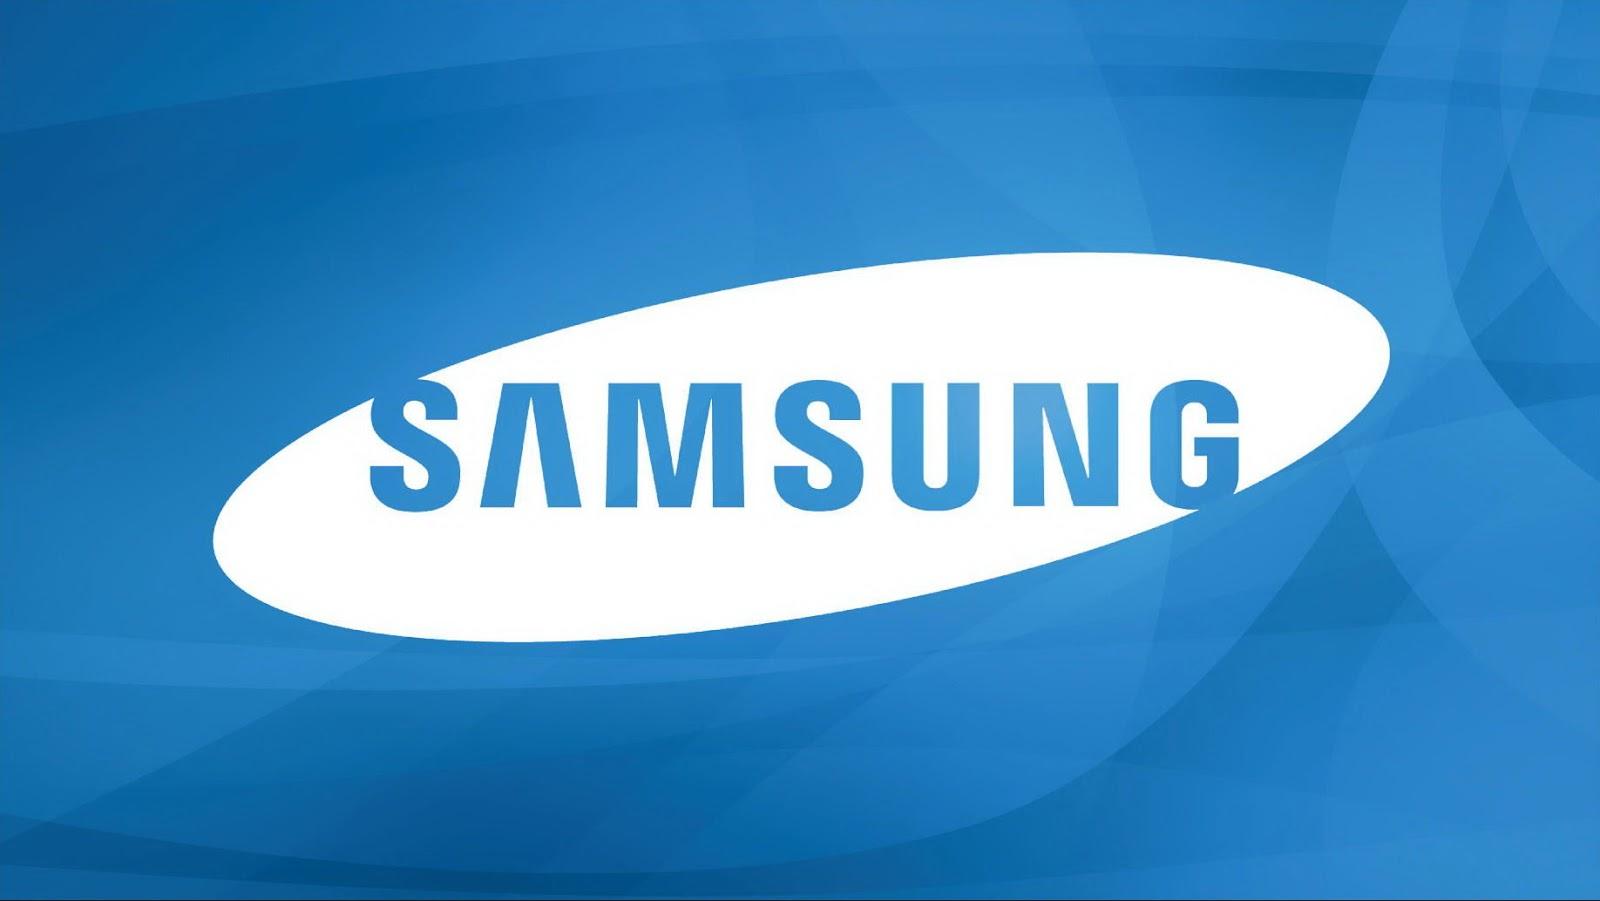 Samsung Logo Wallpaper Blue Colourjpg 1600x901